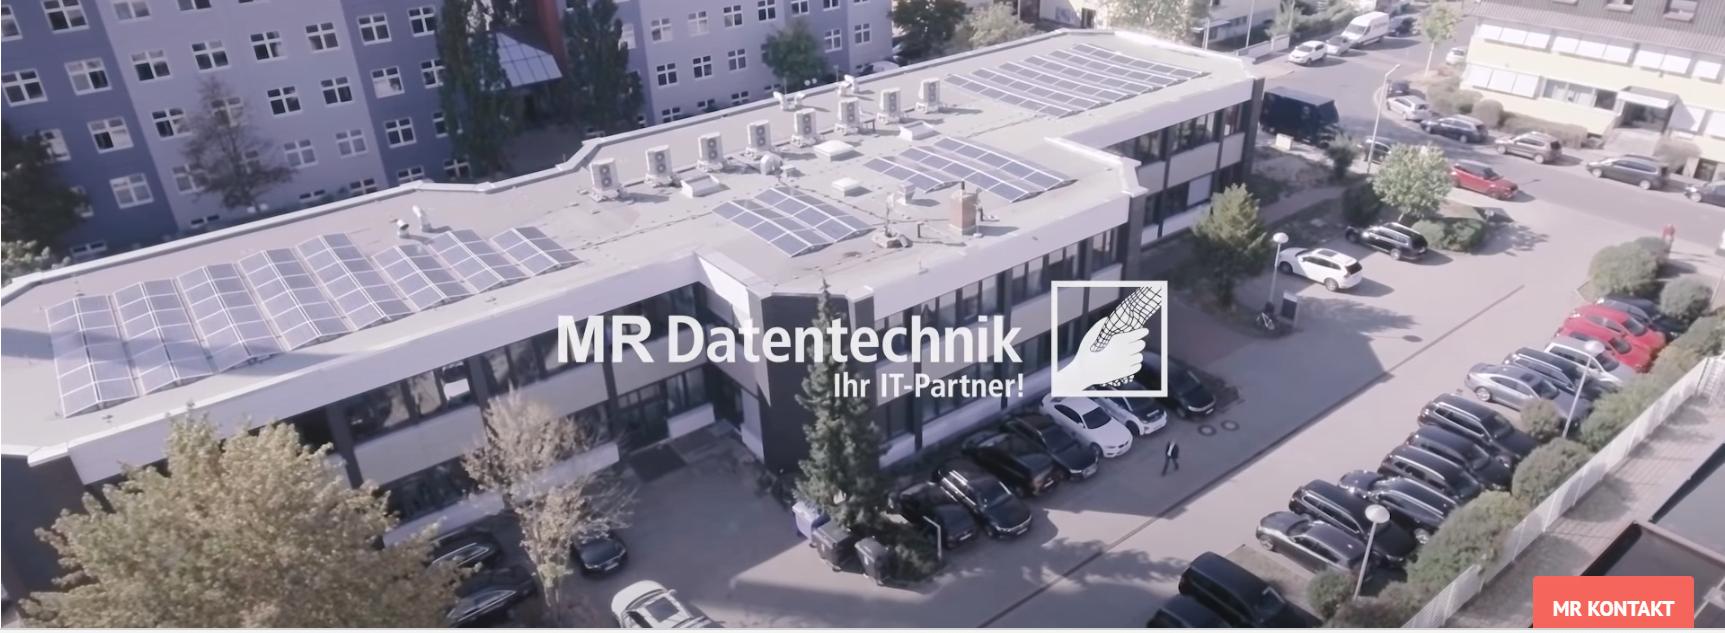 MR Datentechnik Imagefilm